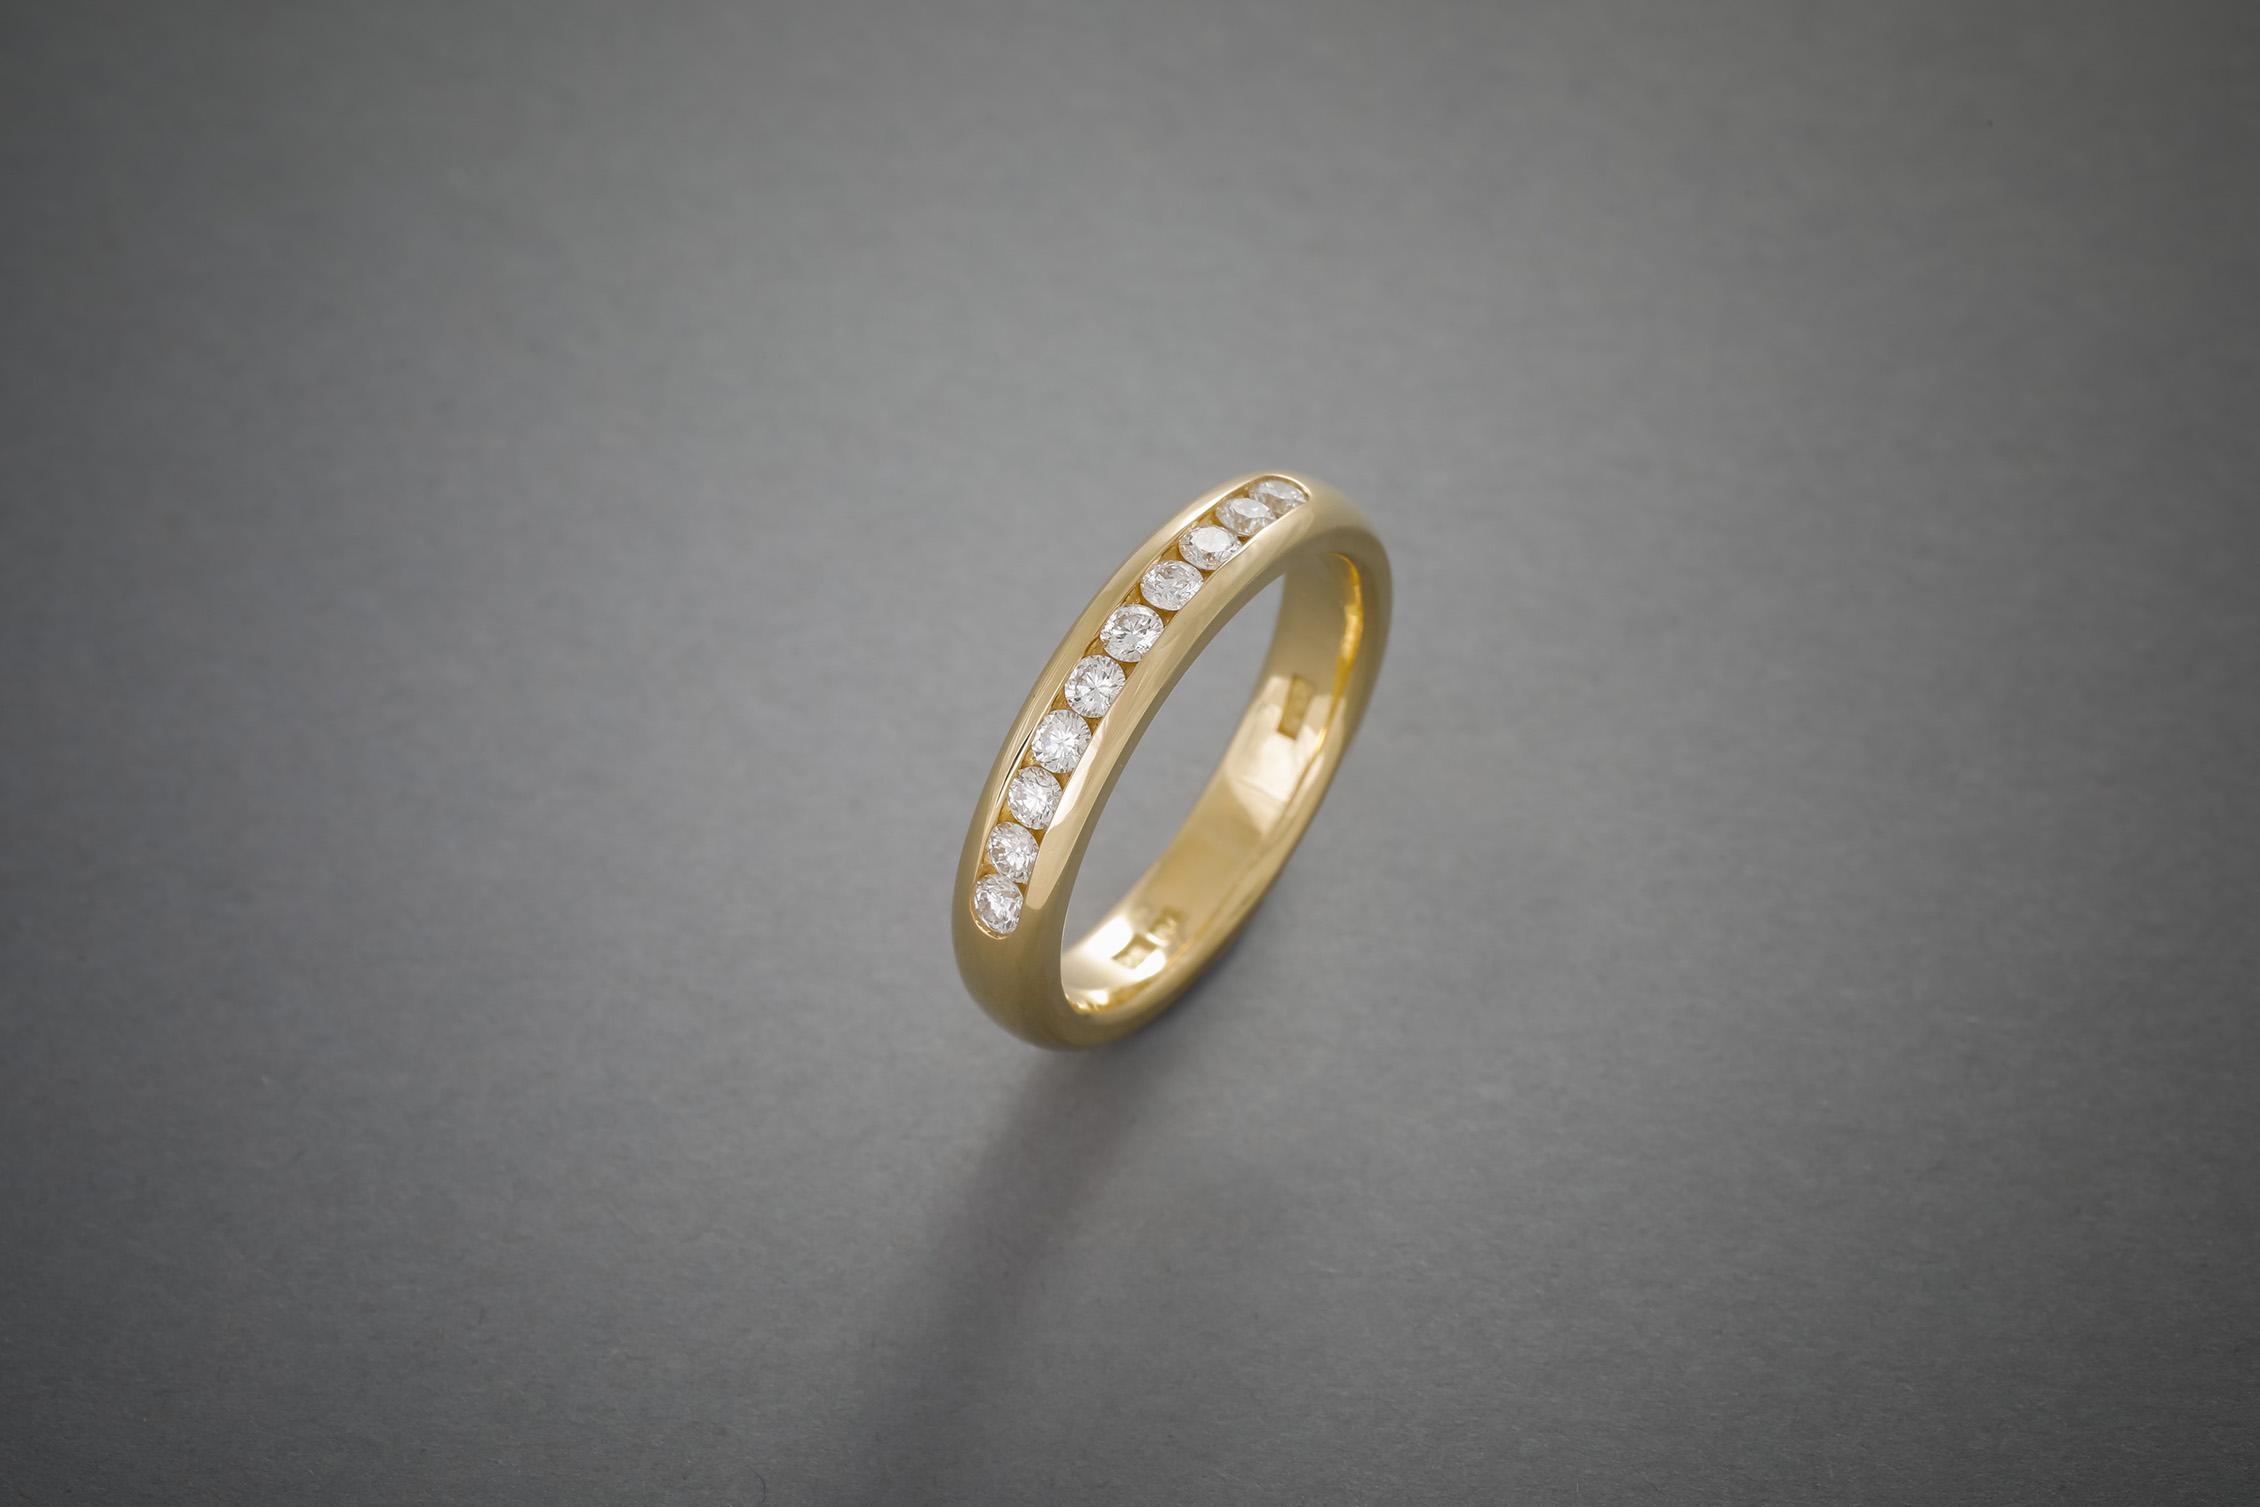 043 18kt Goldring, Brillantreihe, ab € 1938,-